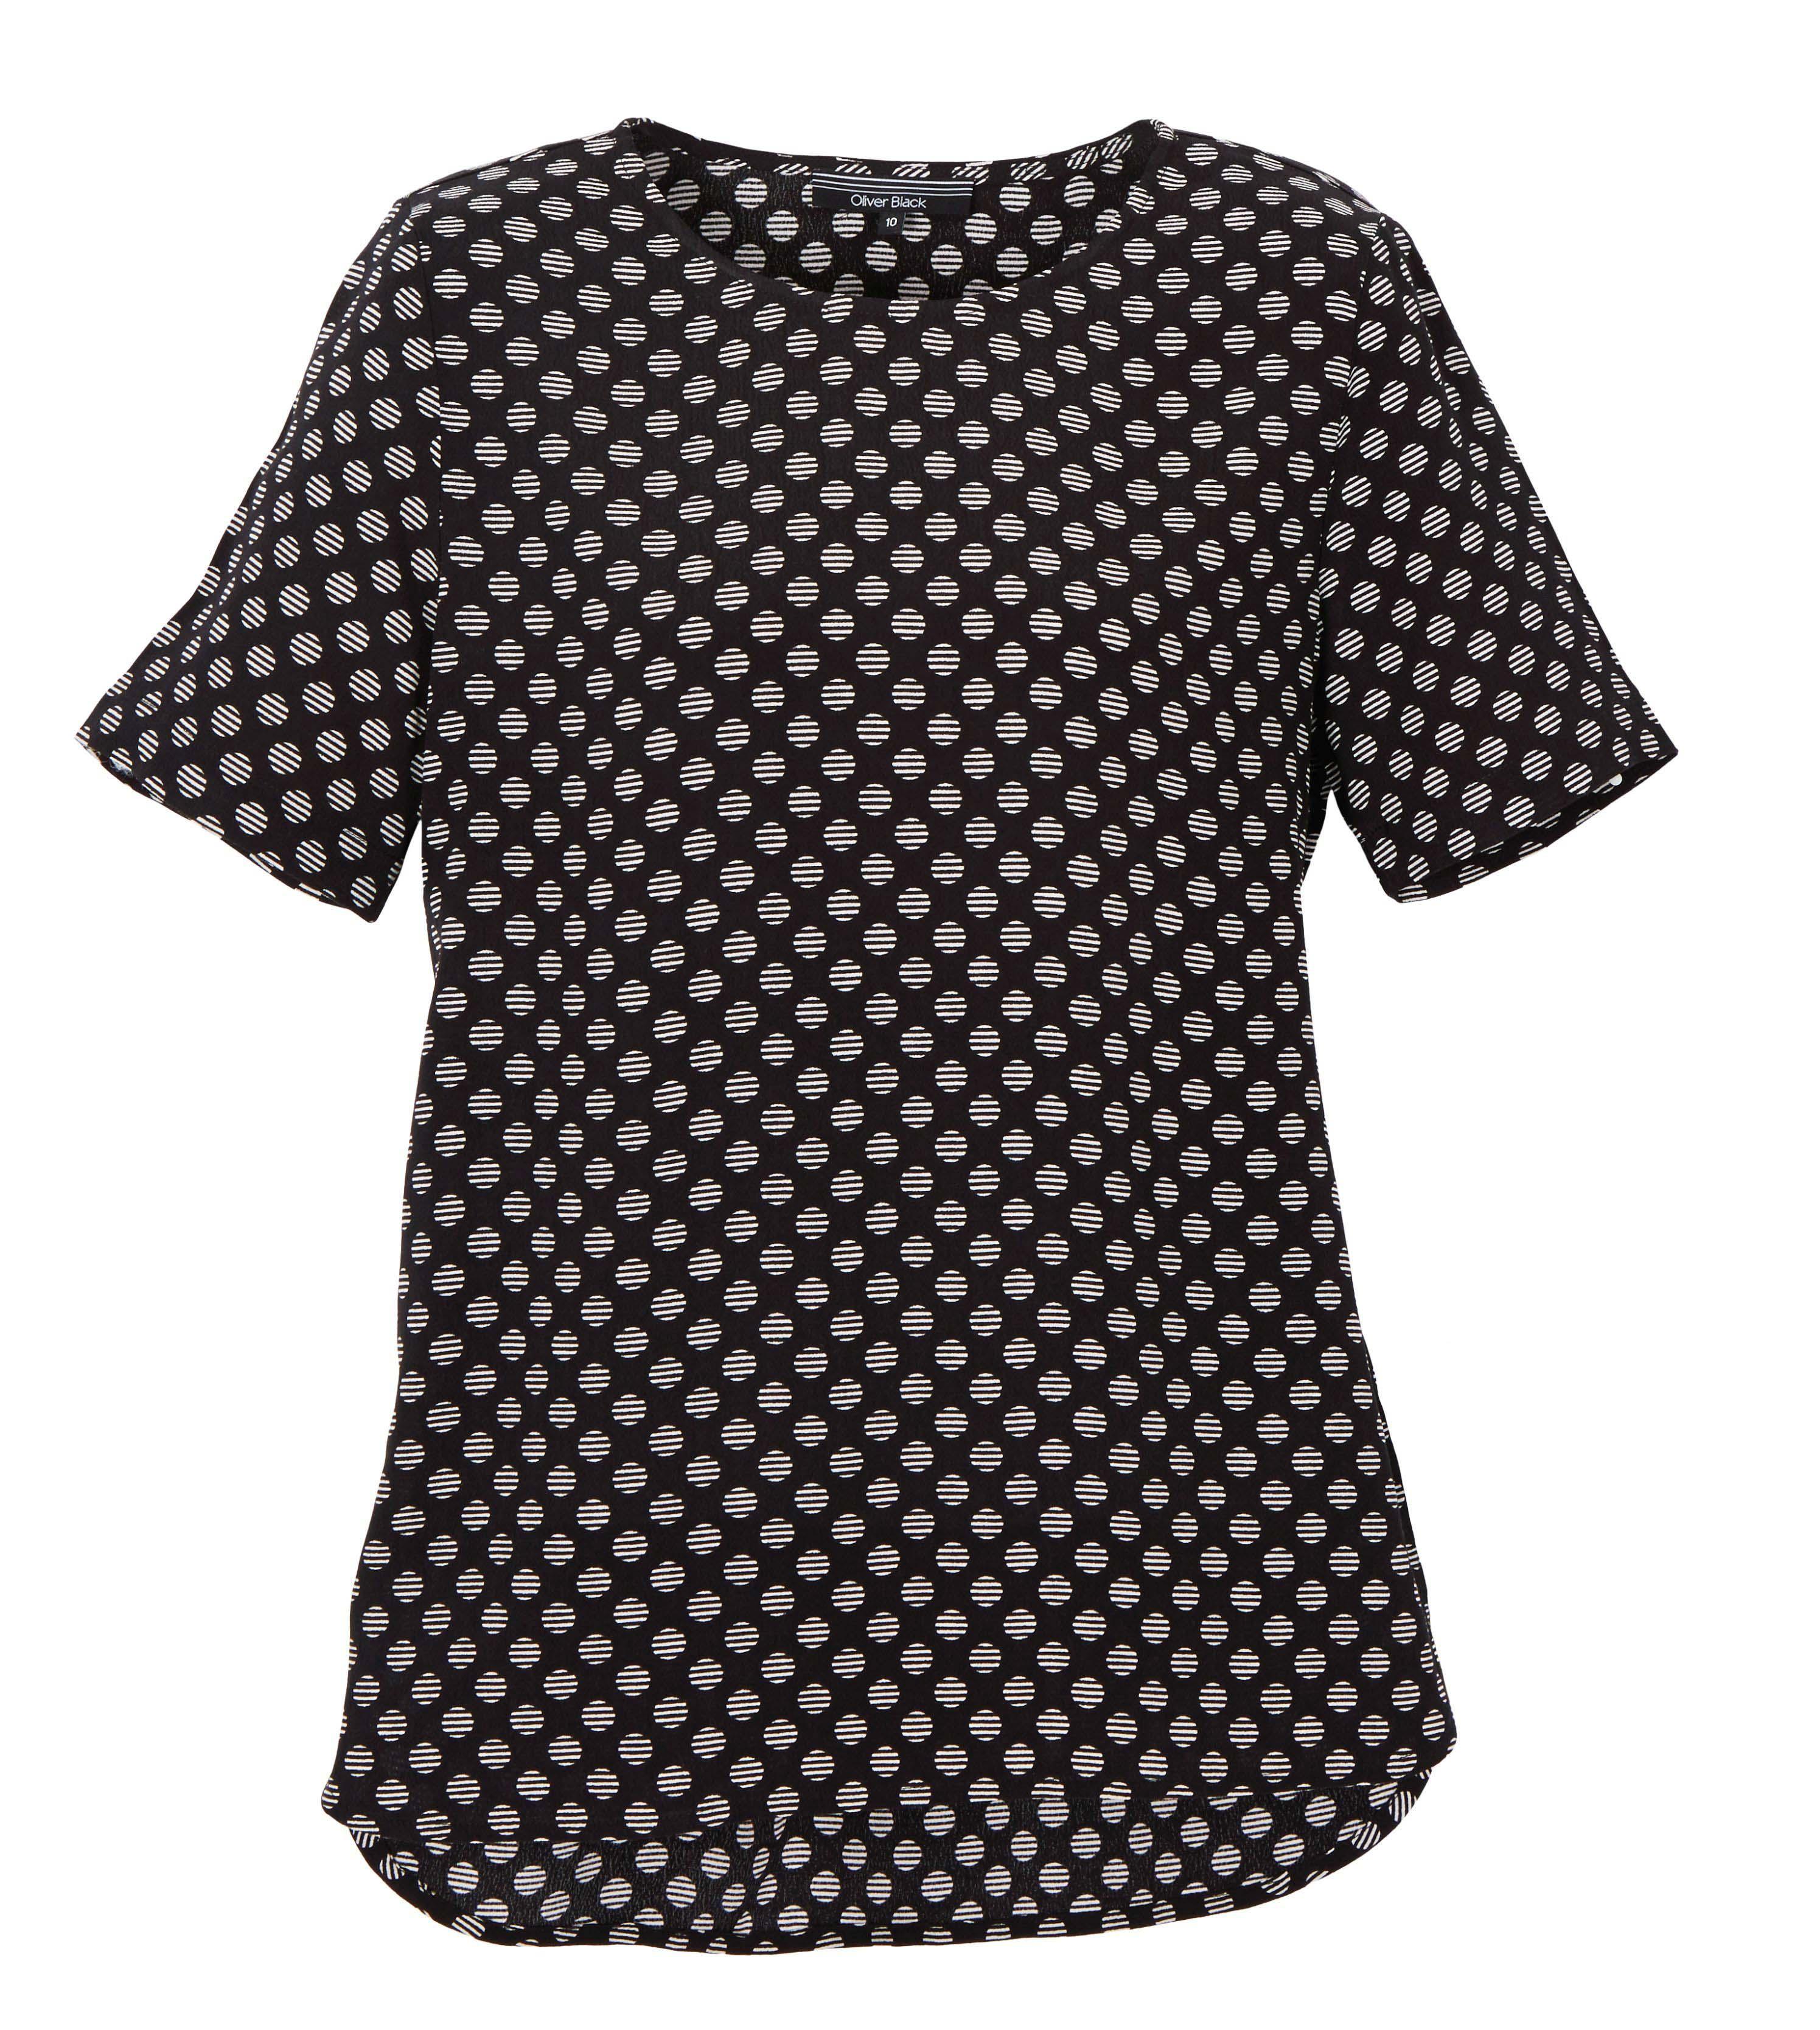 6086766 Oliver Black Dress Knit Printed $89.99 Instore March 20 2016